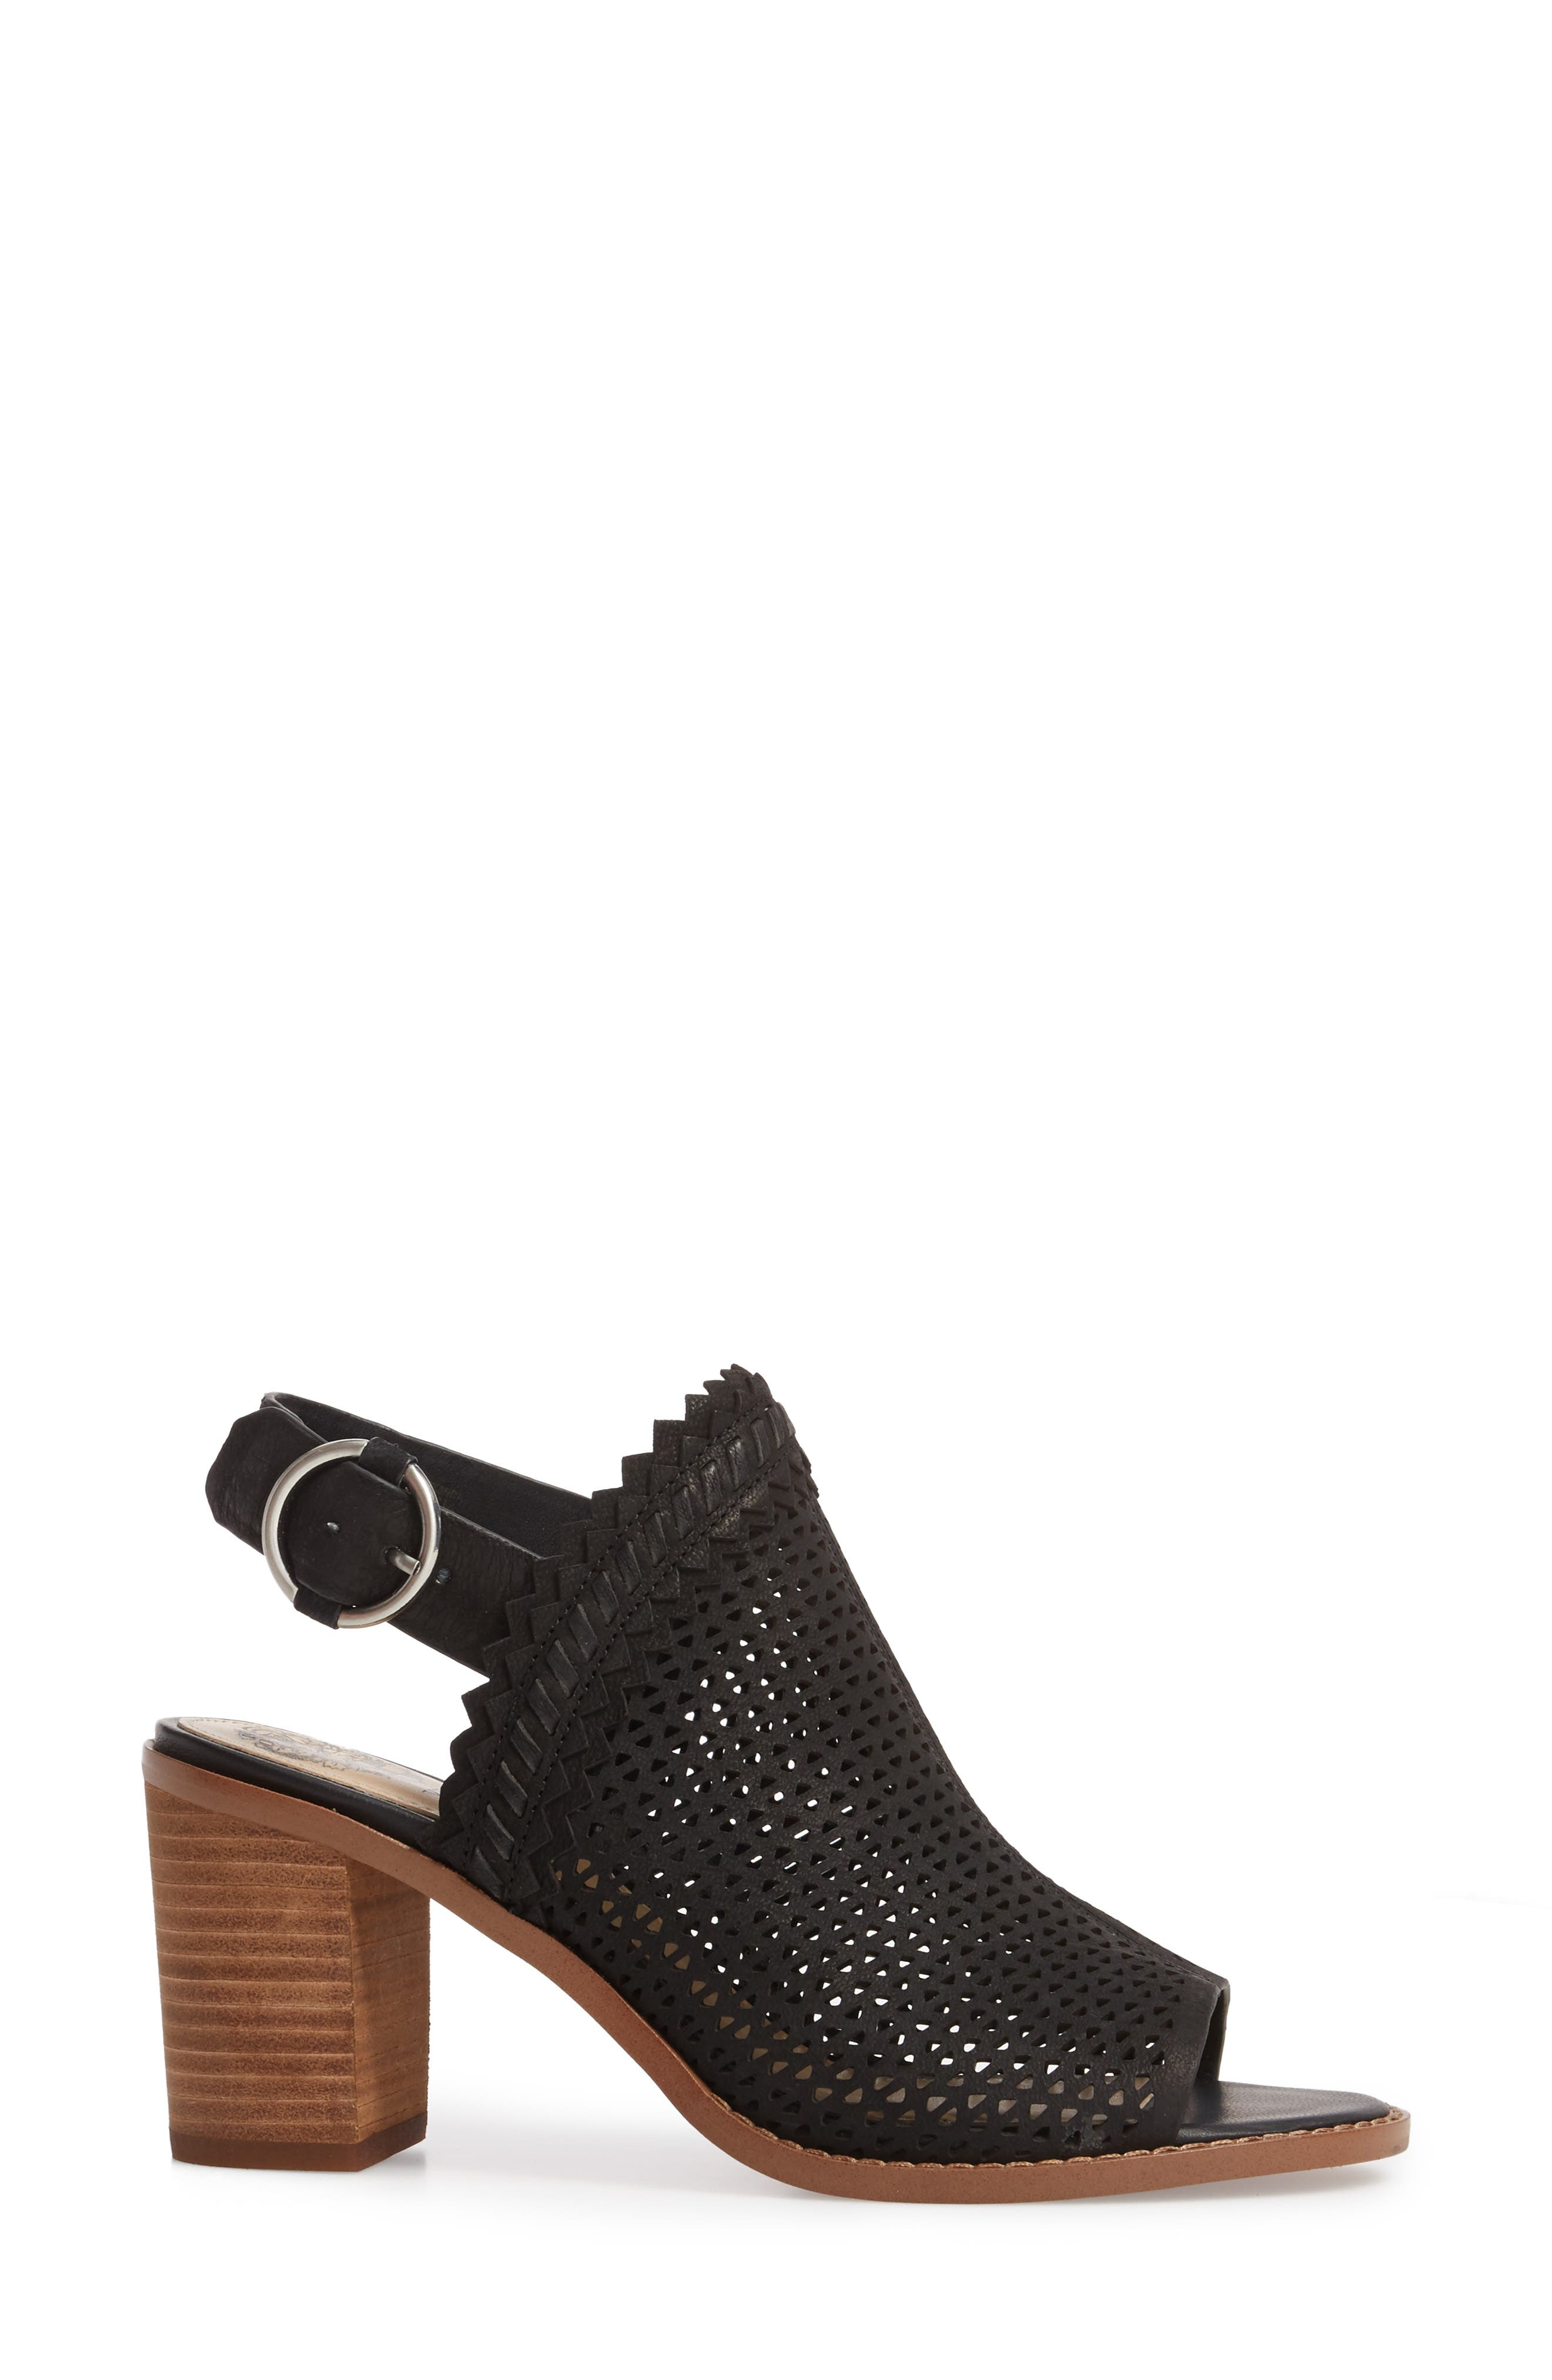 Tricinda Block Heel Sandal,                             Alternate thumbnail 3, color,                             BLACK LEATHER